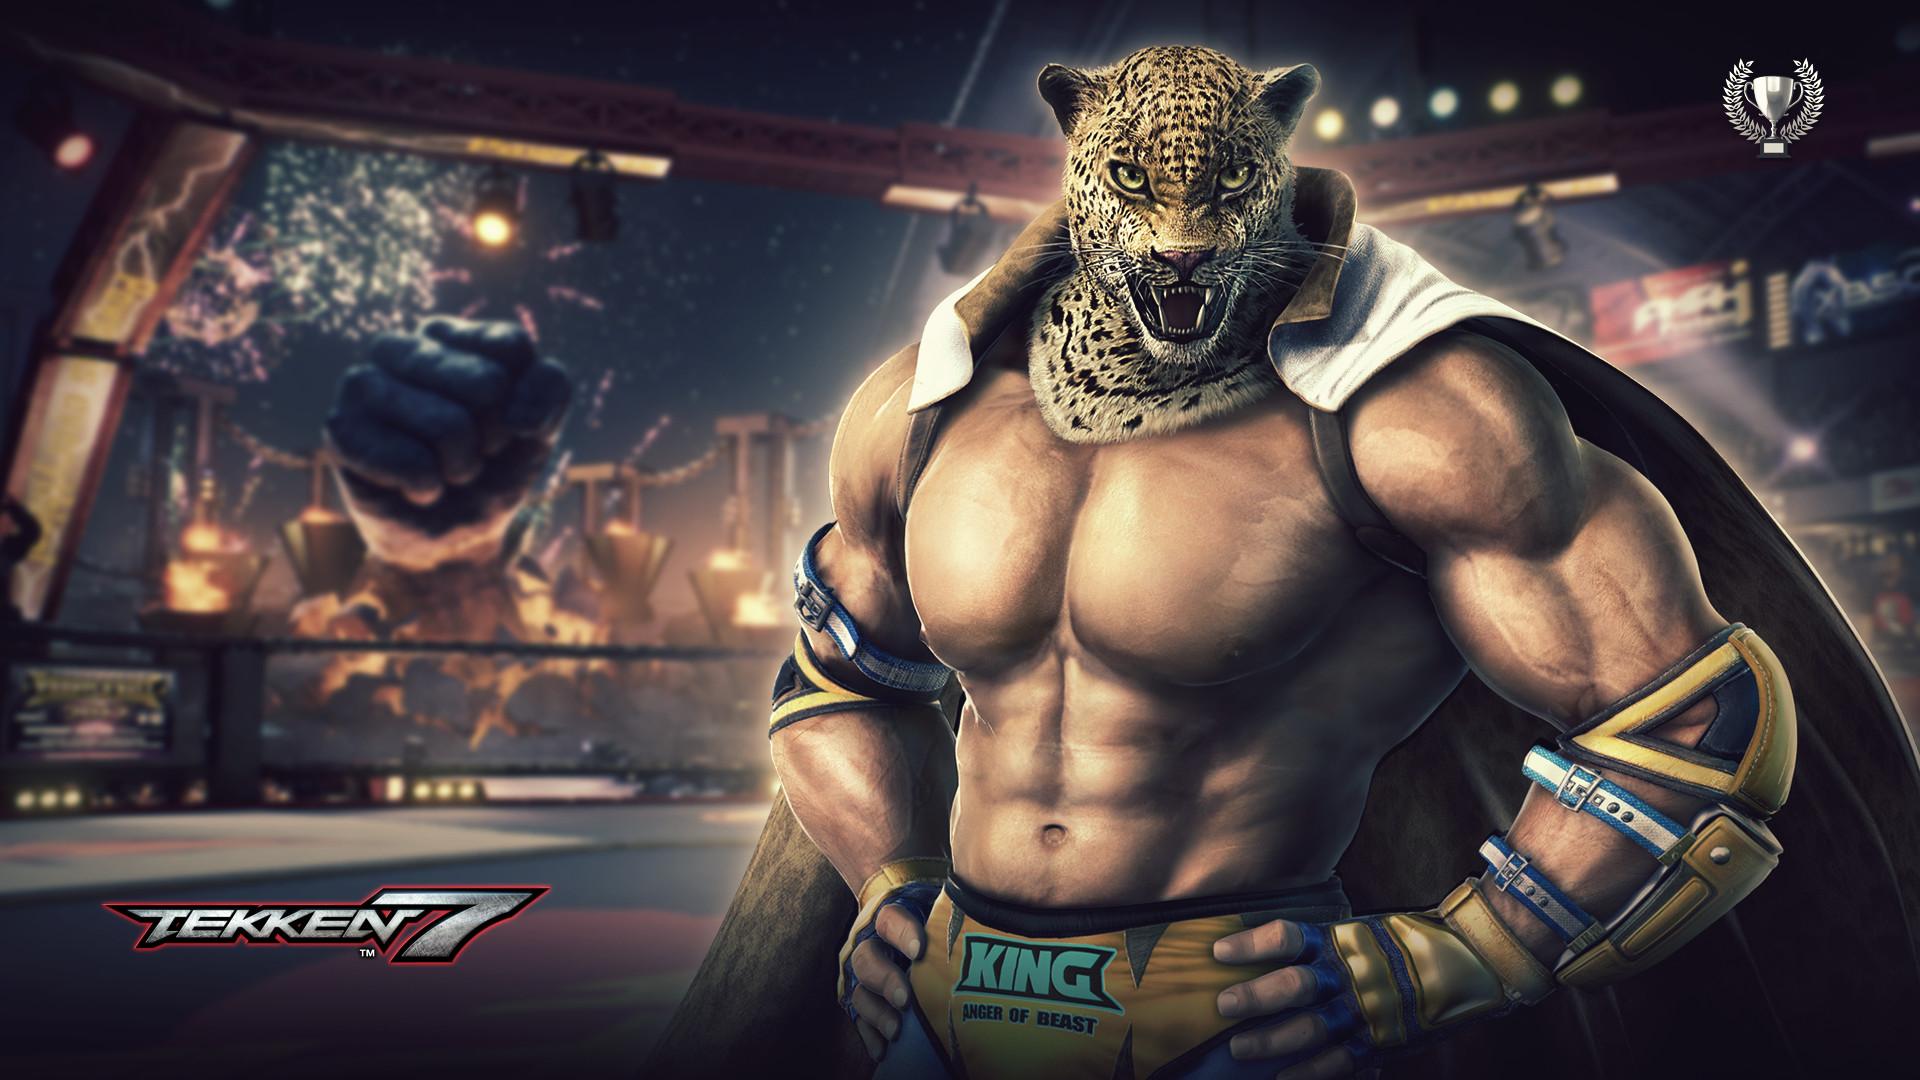 Tekken King Wallpaper 67 Images